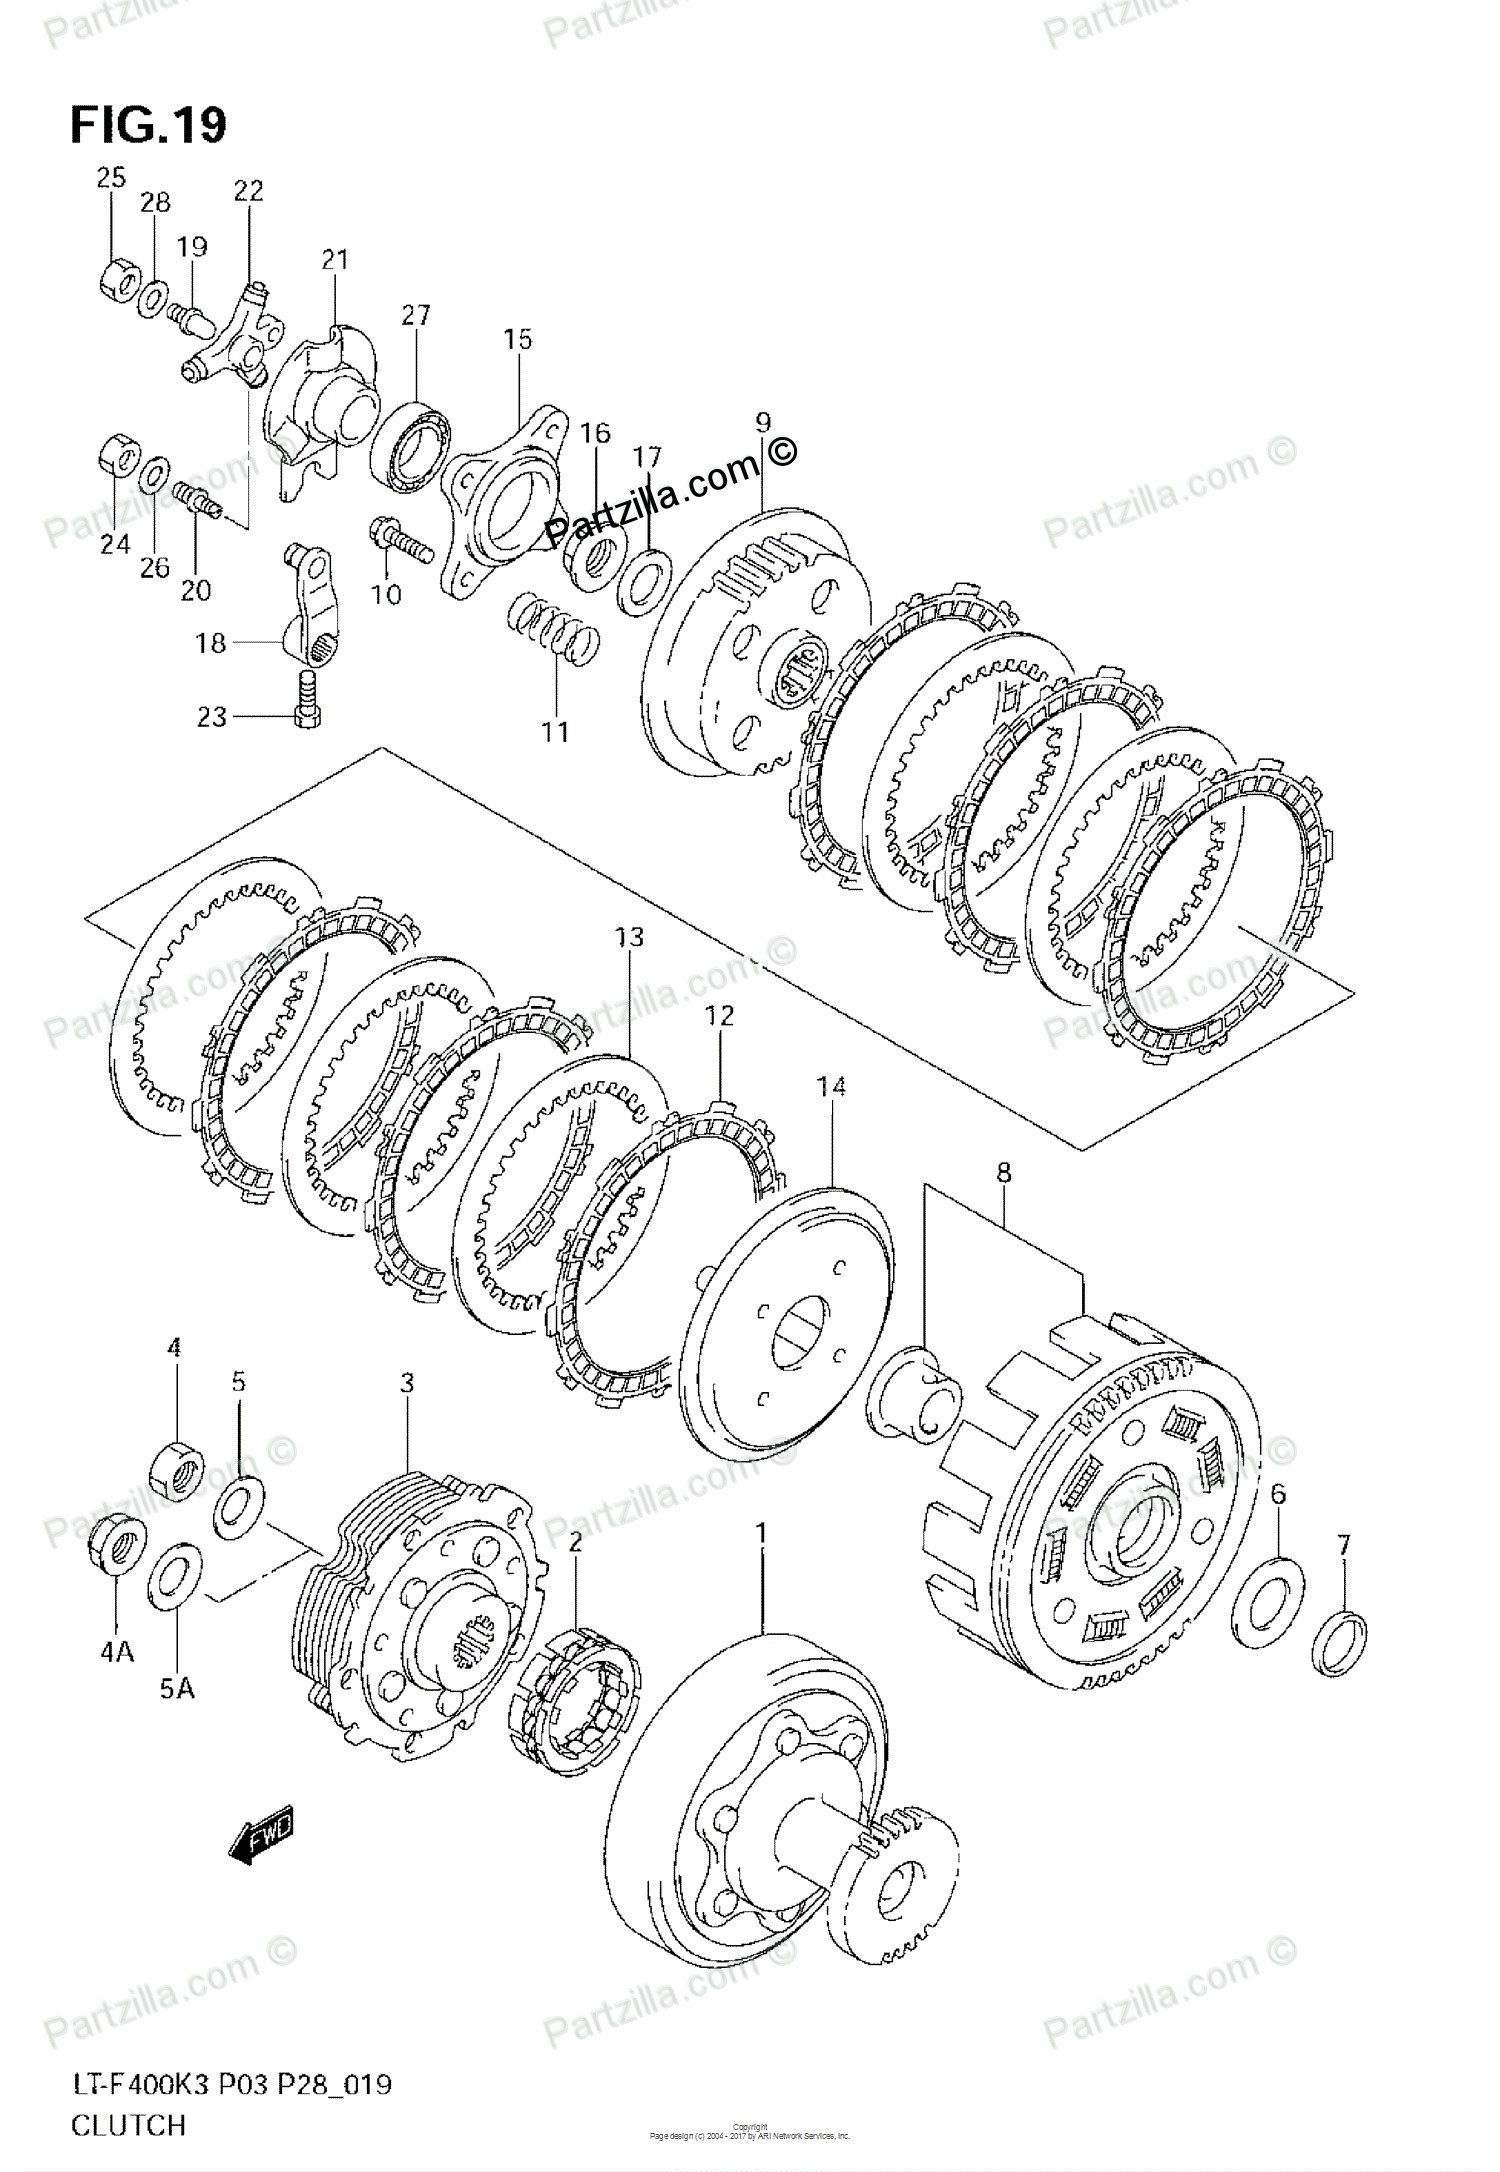 Clutch Parts Diagram 1964 Lincoln Continental Wiring Suzuki Atv 2004 Oem For Model K3 Partzilla Of